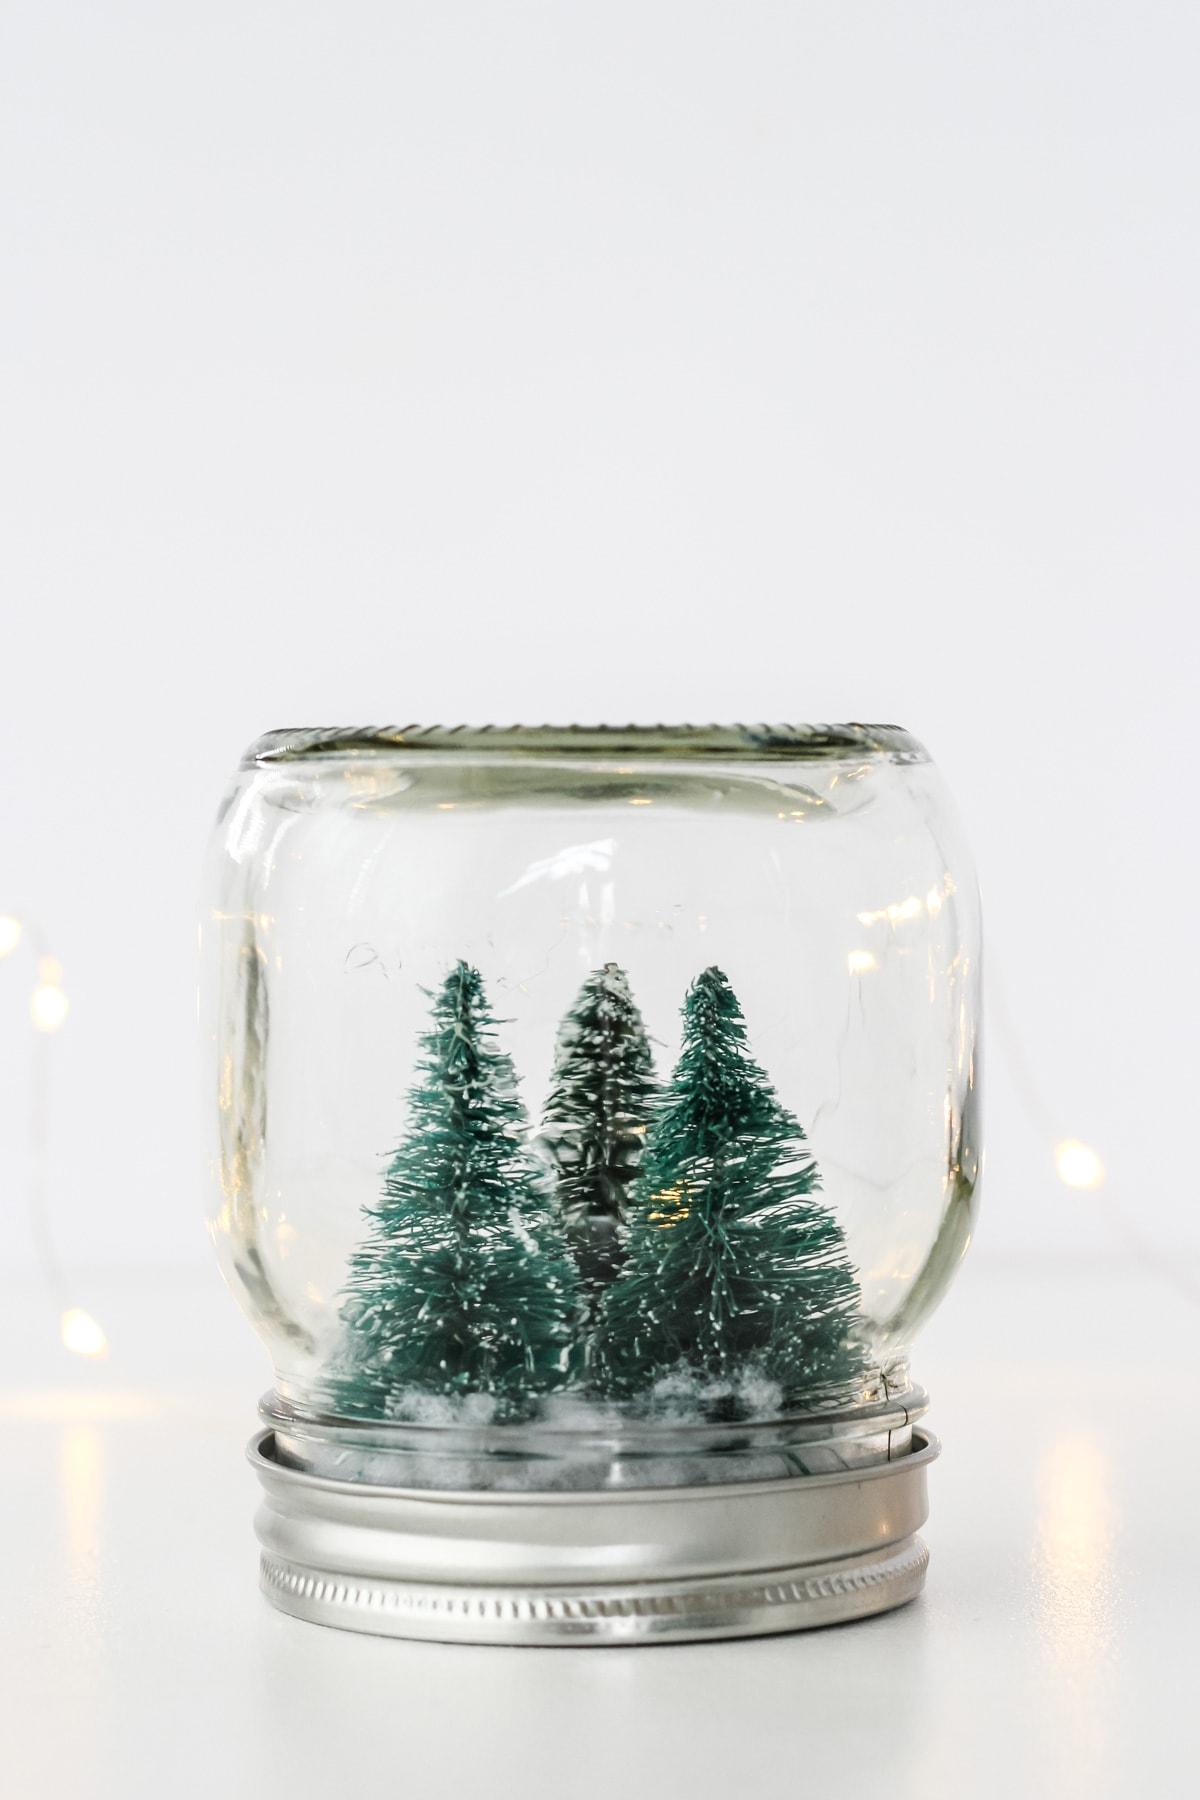 DIY Winter Wonderland Snow Globe